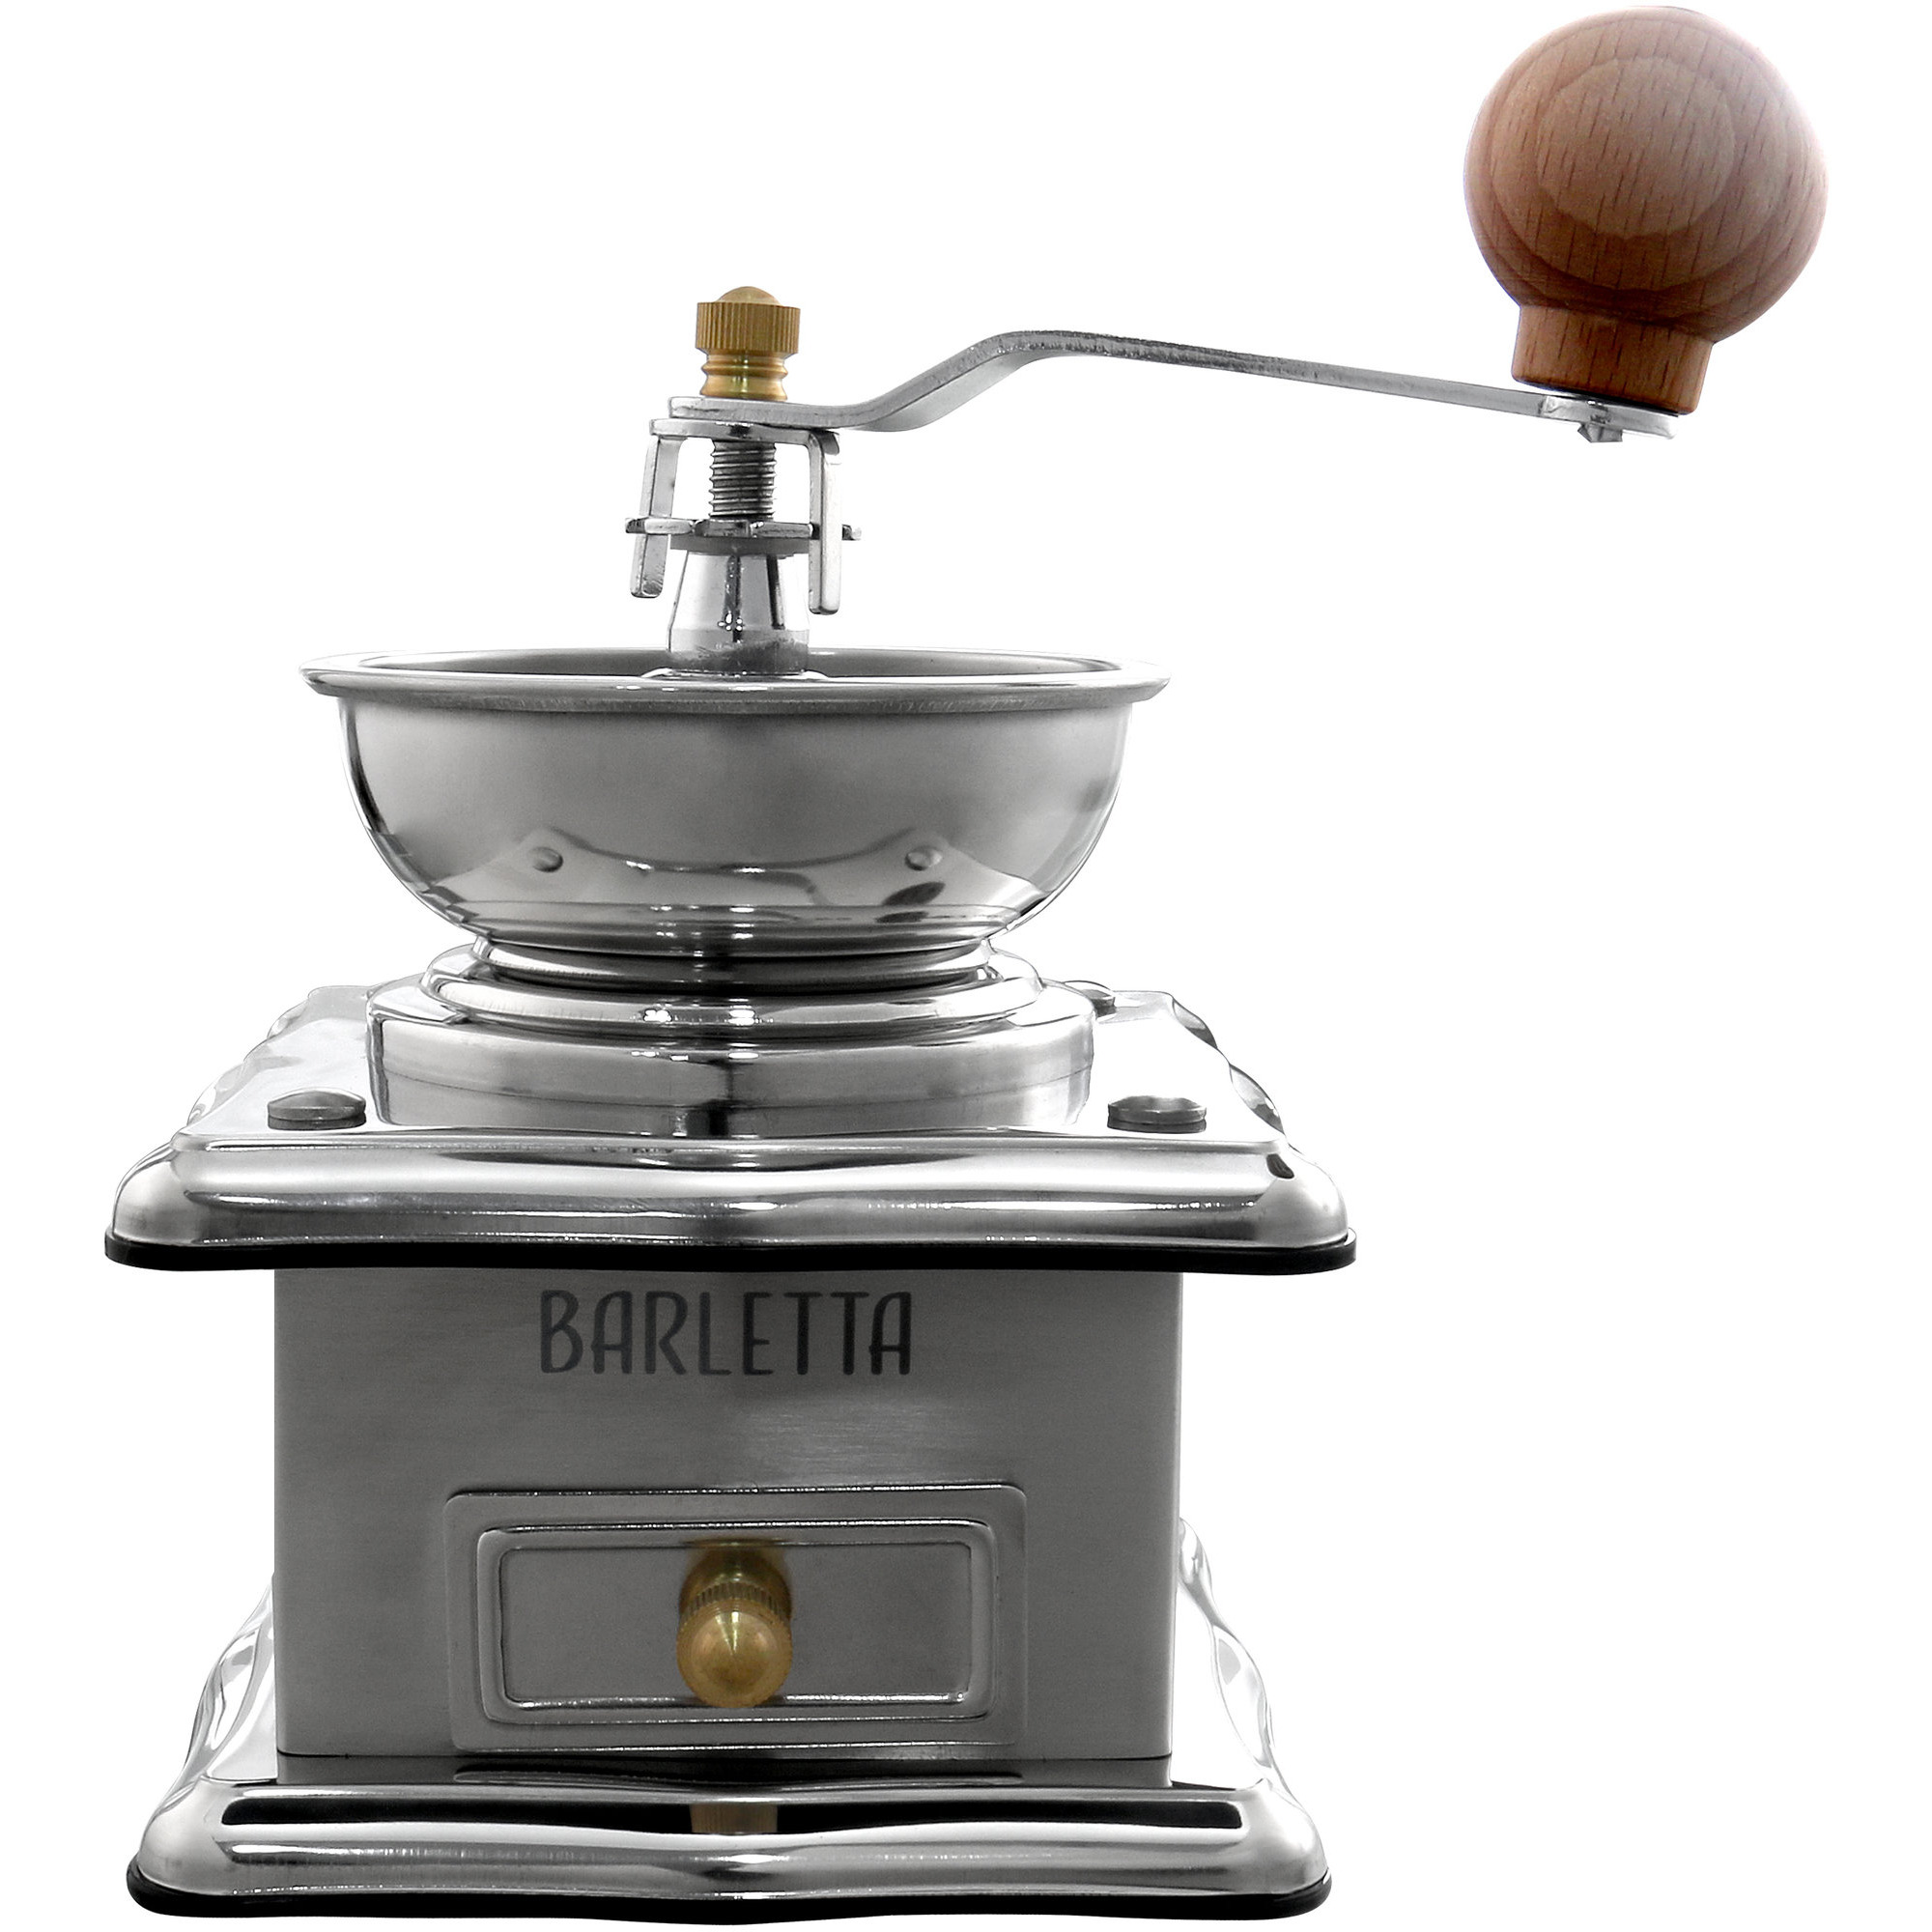 Barletta Kaffekvarn